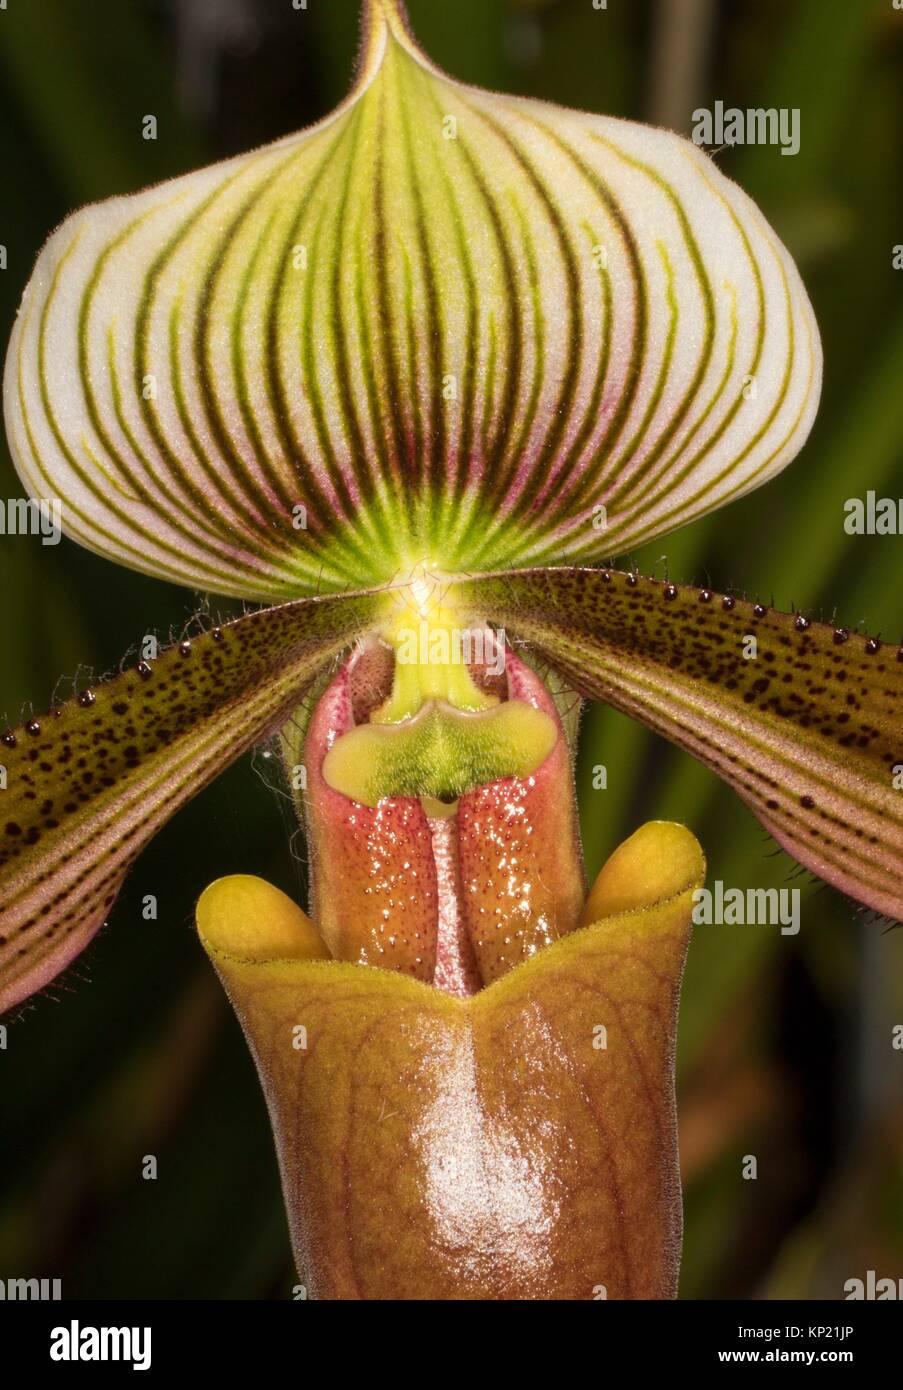 Paphiopedilum orchid, Cherry City Orchid Society Show, Salem, Oregon. Stock Photo